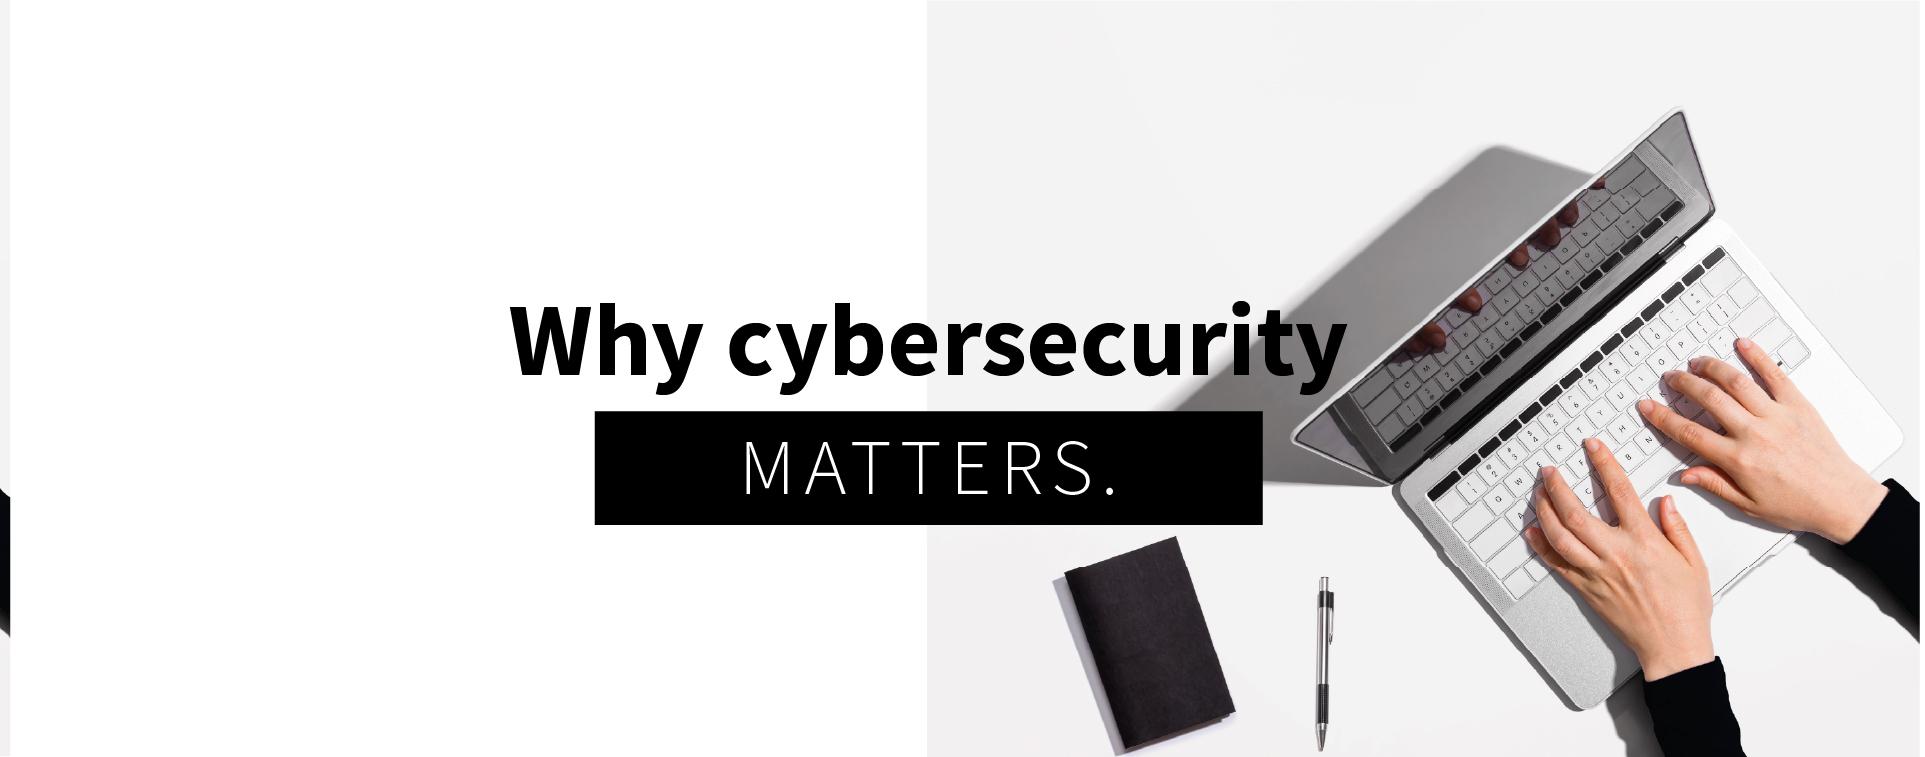 impact of cybercrime